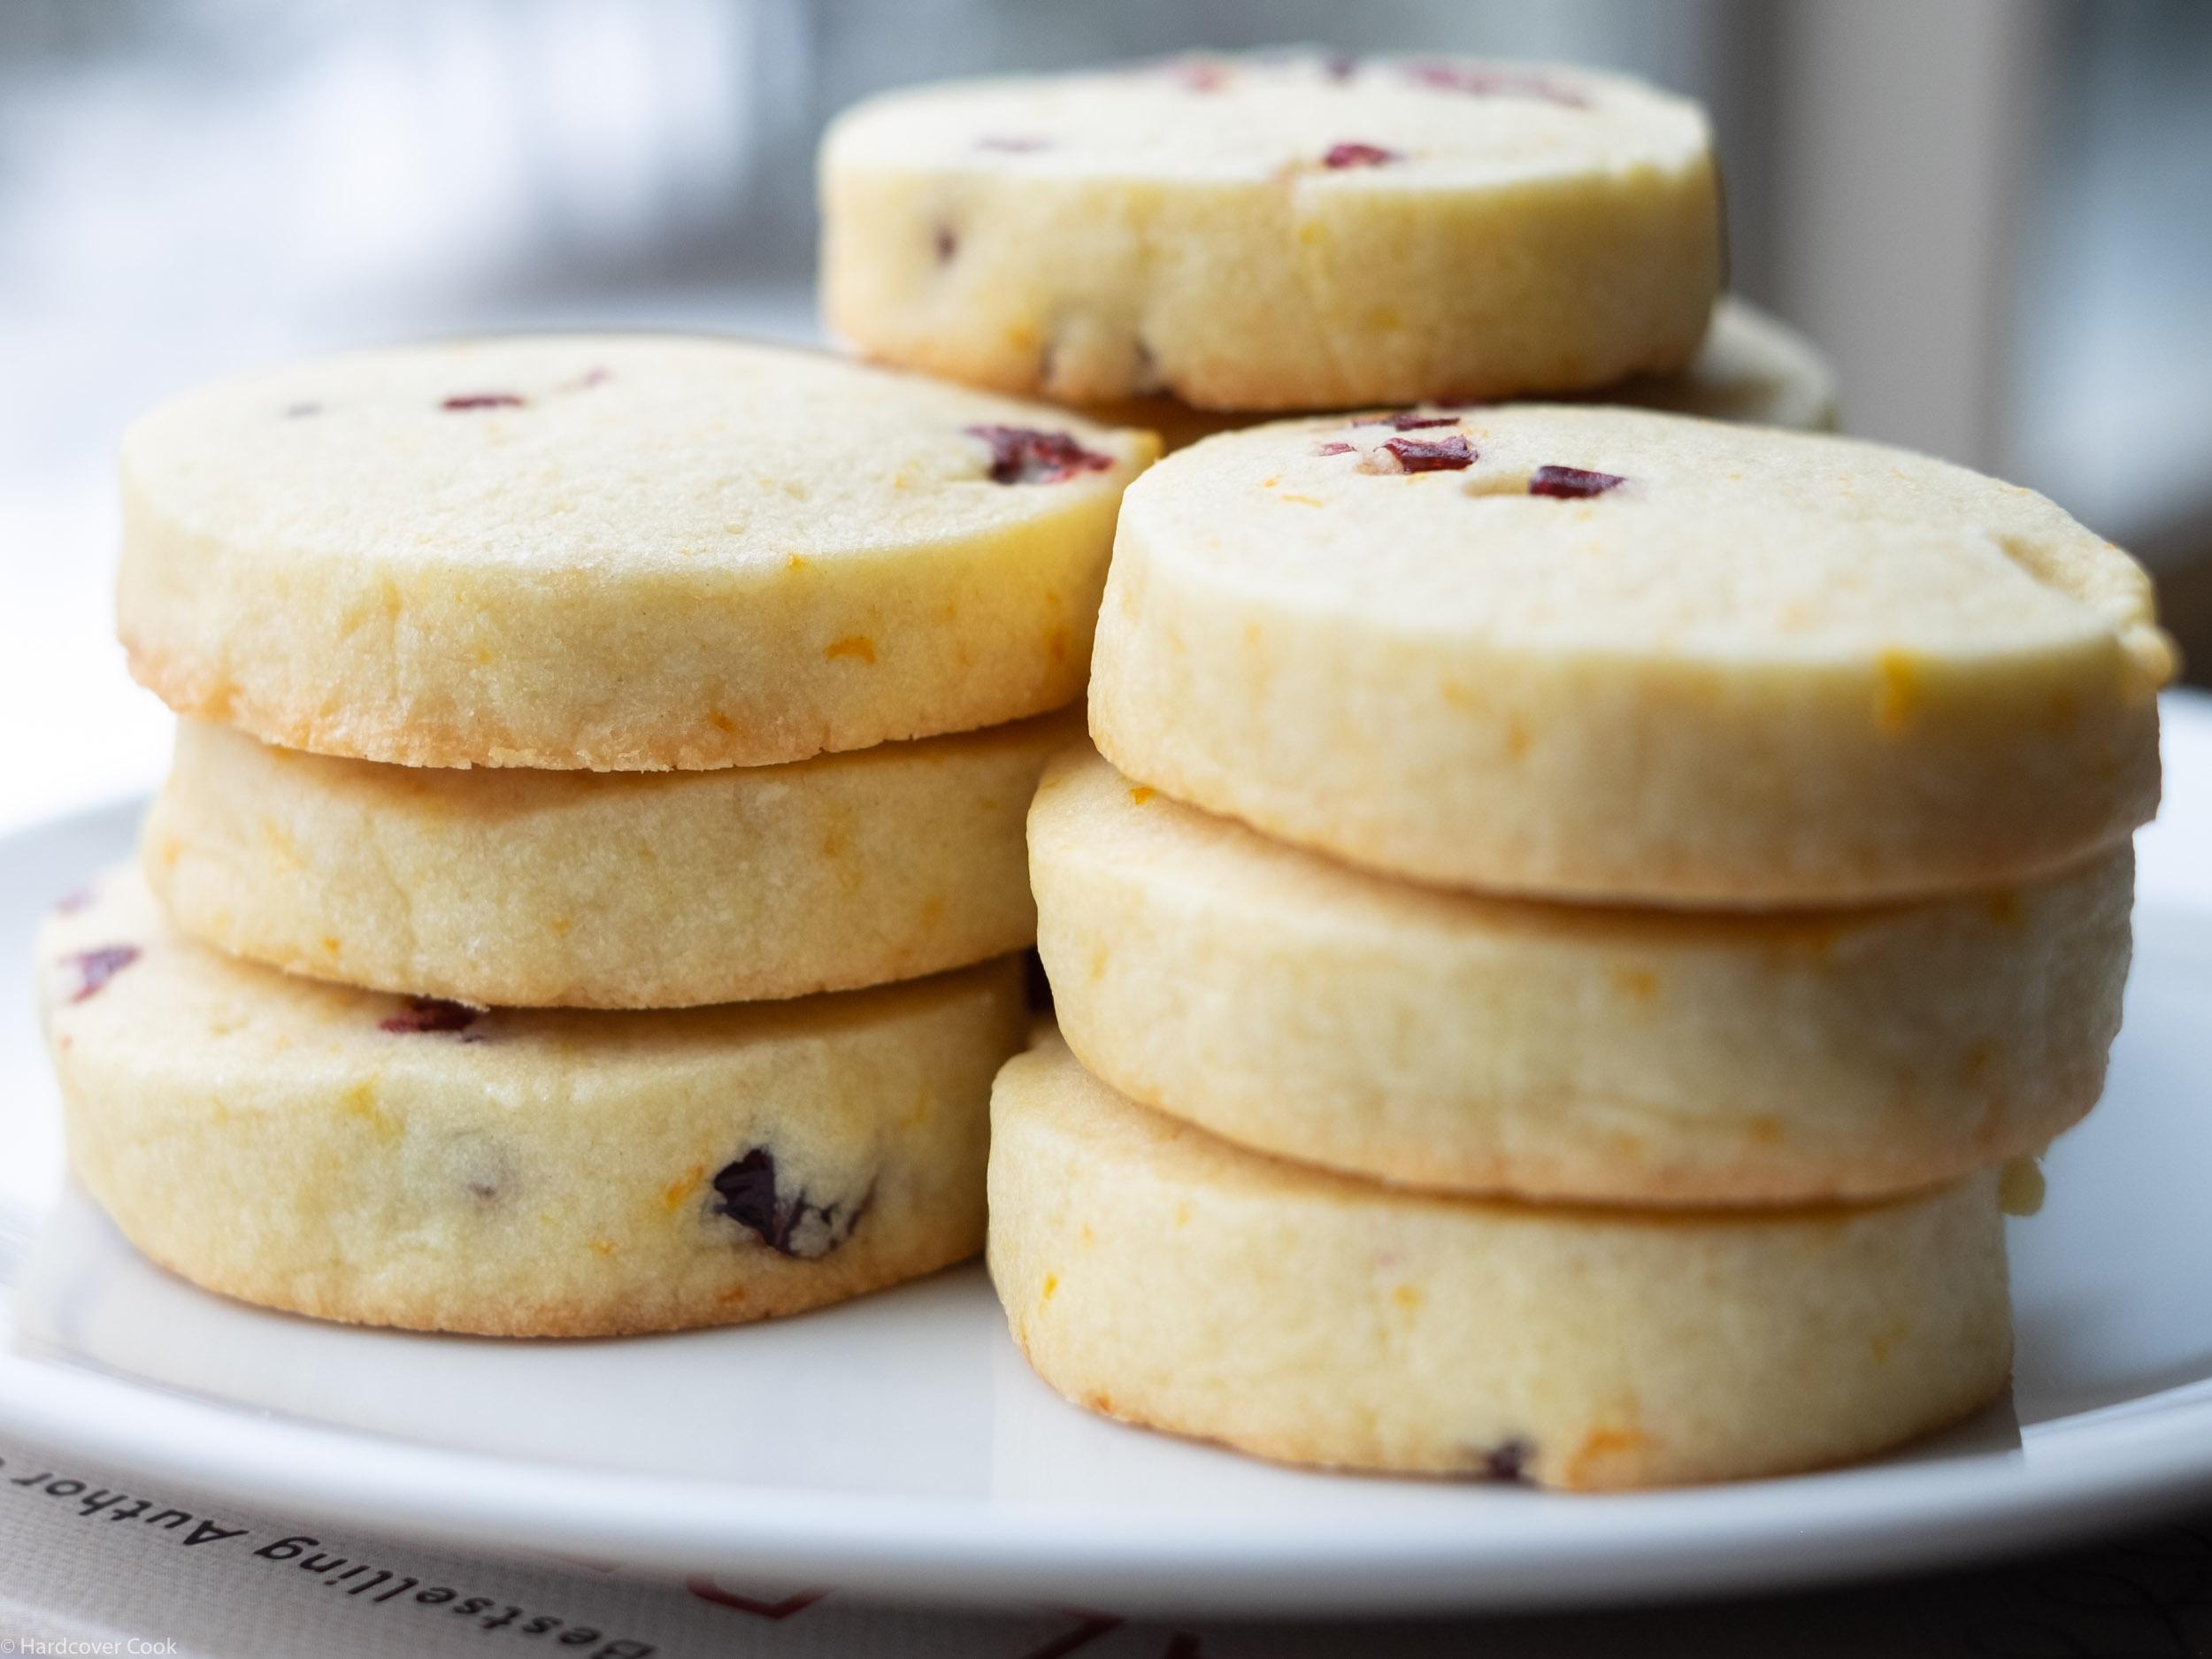 Cran-Orange Shortbread Cookies, p. 108